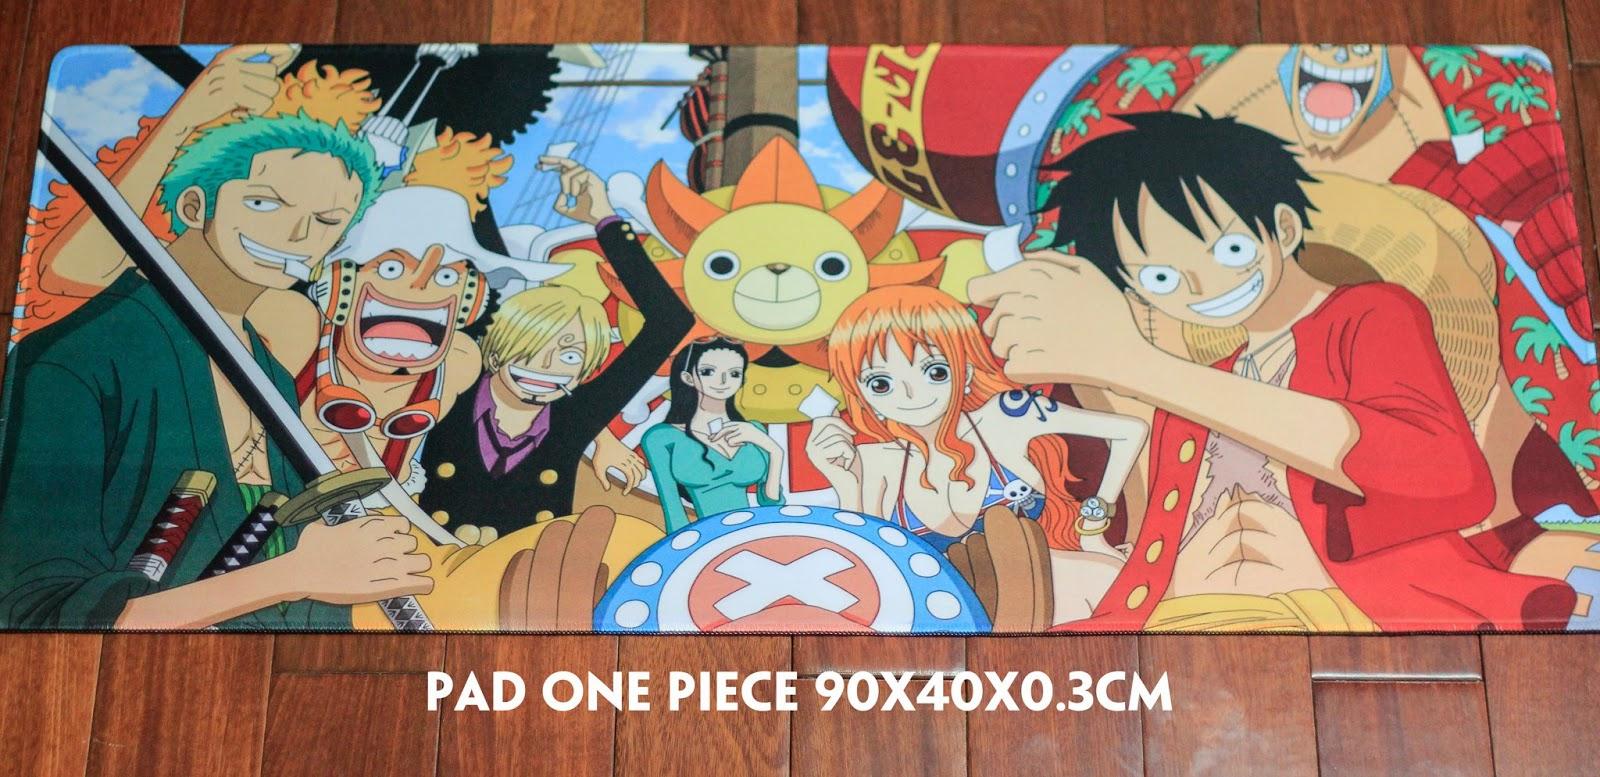 Gamming Mousepad: One piece, CS, CF, LMHT, Doraemon, Naruto, Dota2!!! - 2